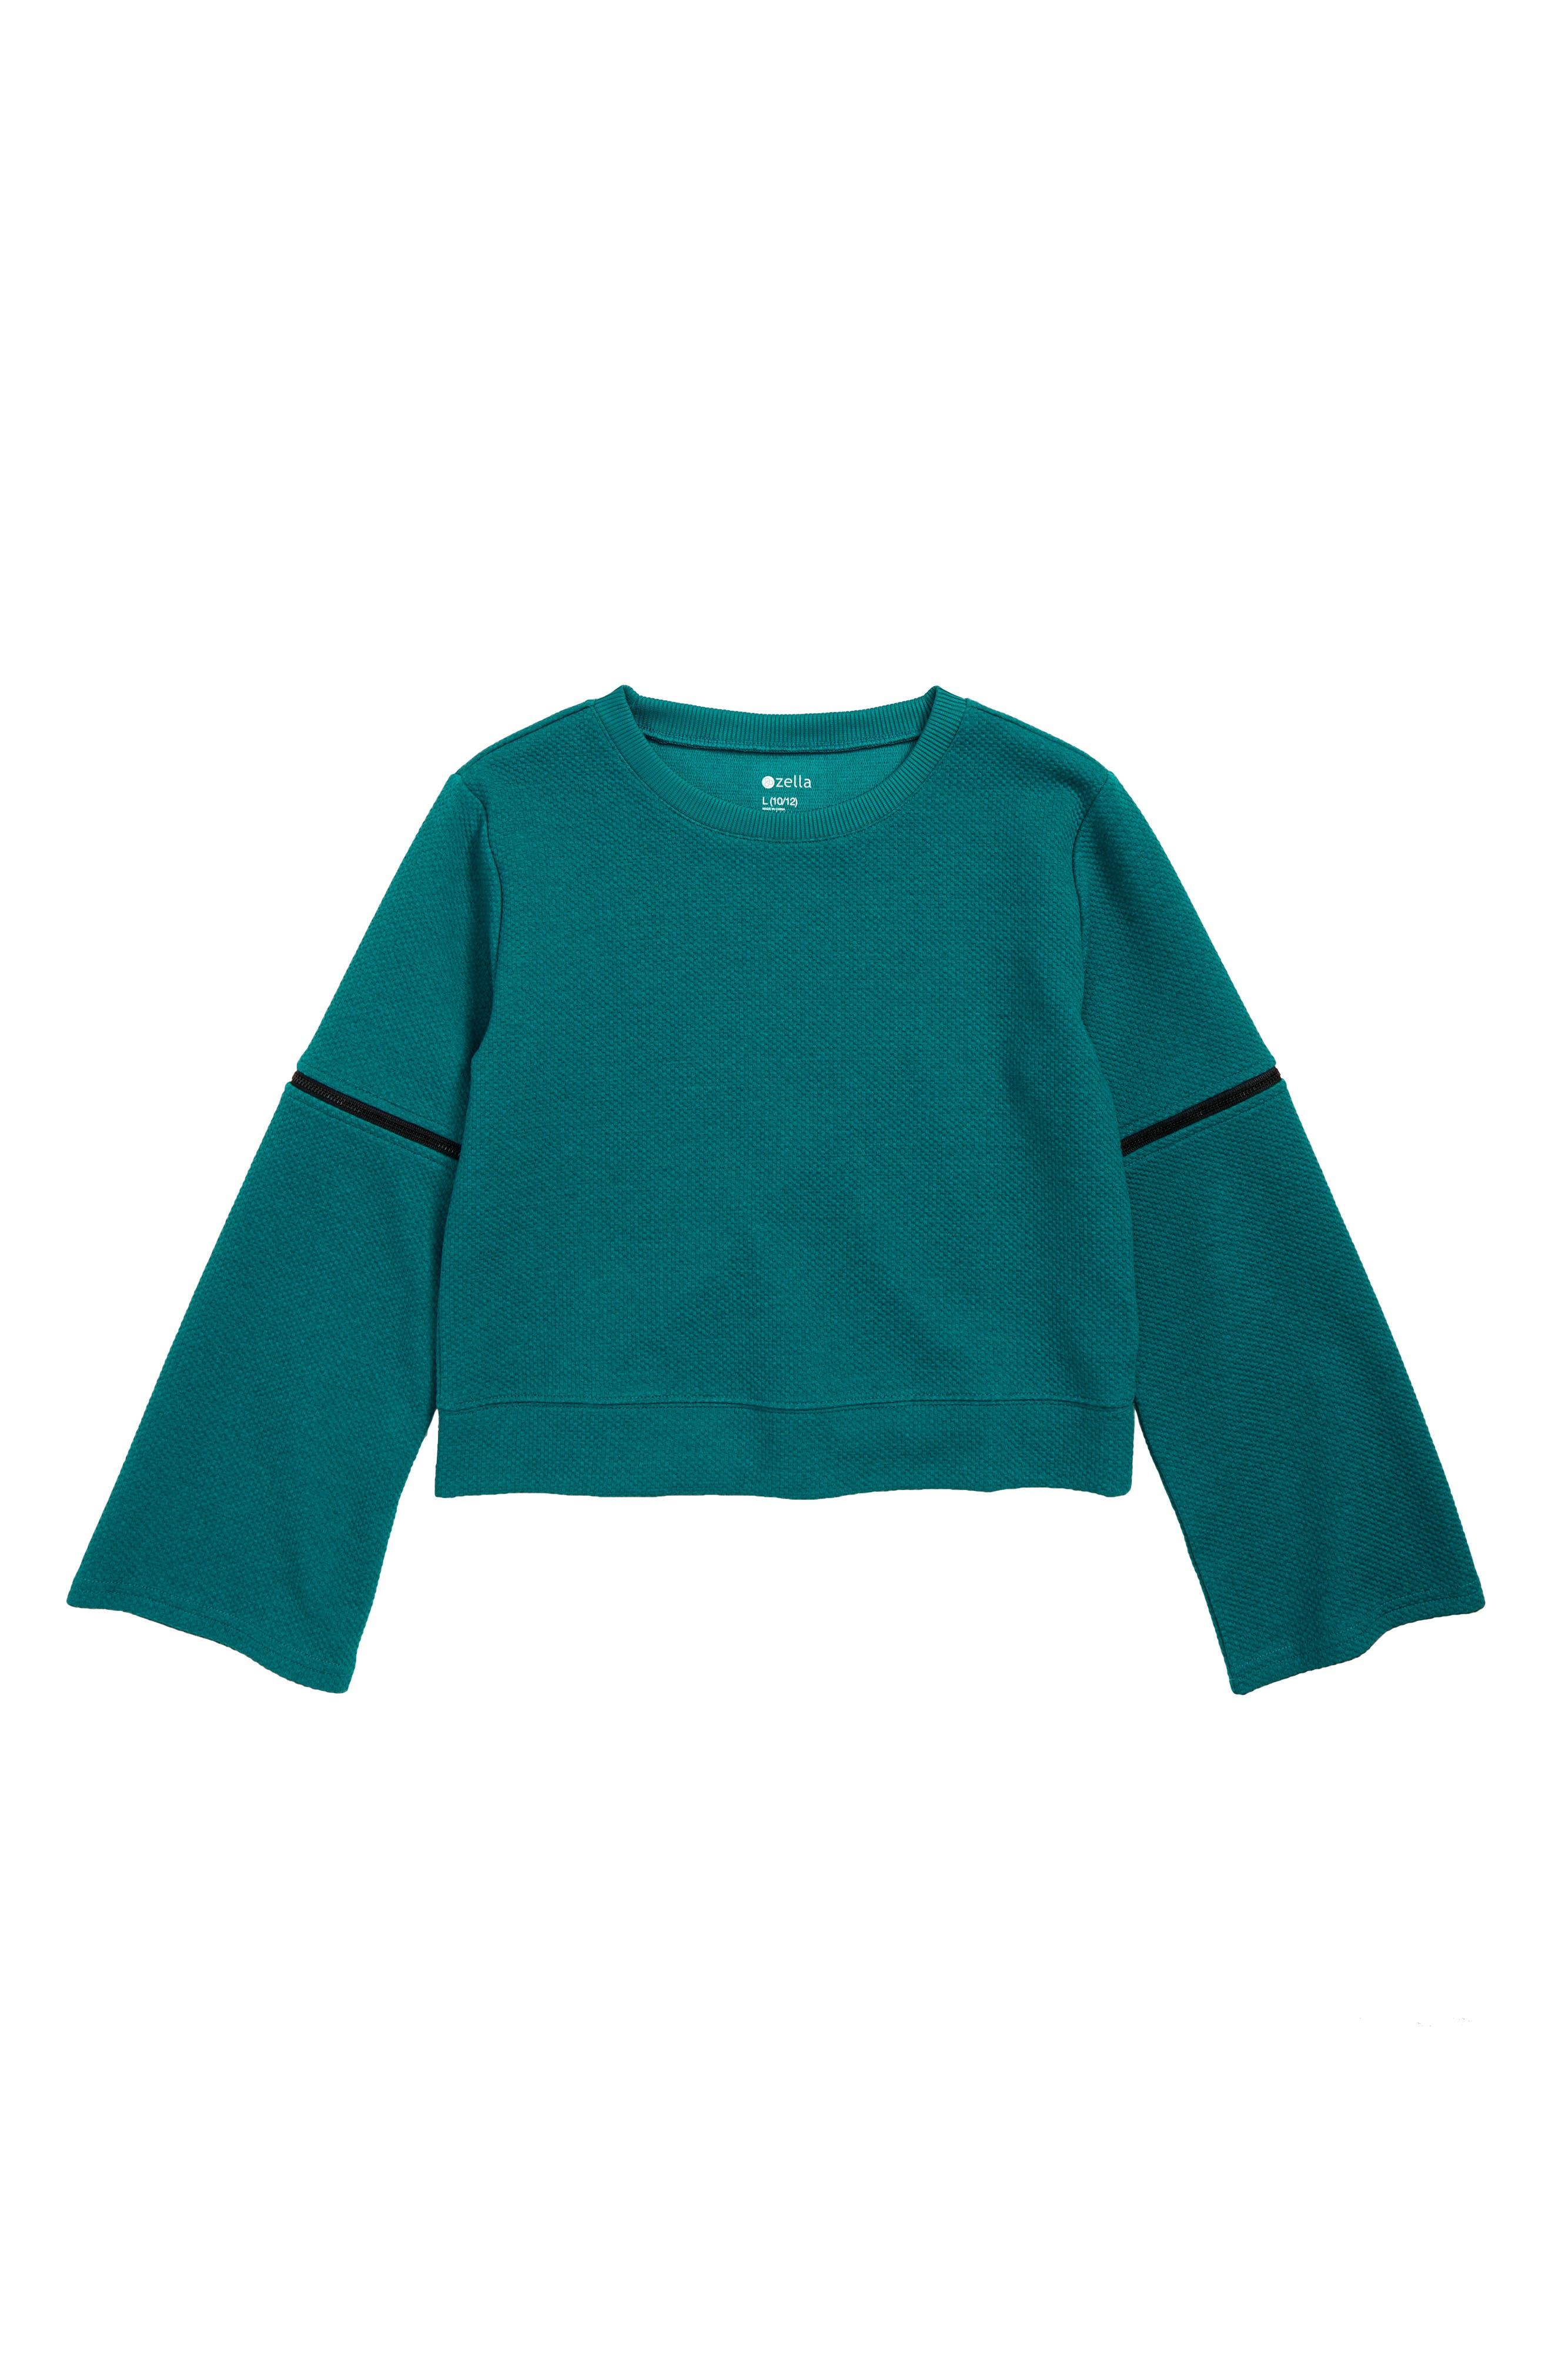 ZELLA GIRL, Zip Bell Sleeve Pullover, Main thumbnail 1, color, 449